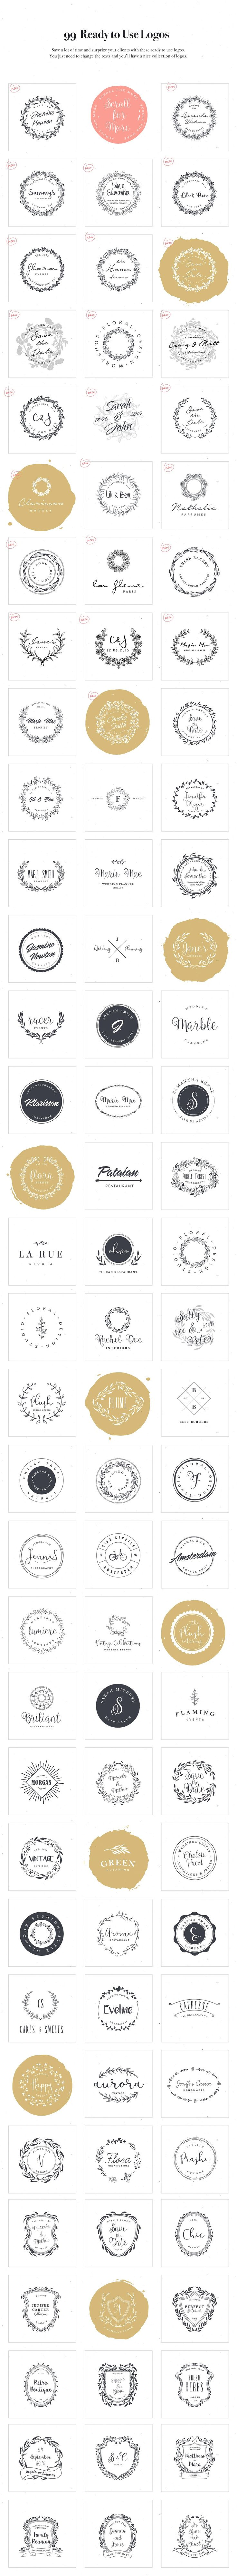 Logo Design Kit • Available here → https://creativemarket.com/VladCristea/573841-Logo-Design-Kit?u=pxcr